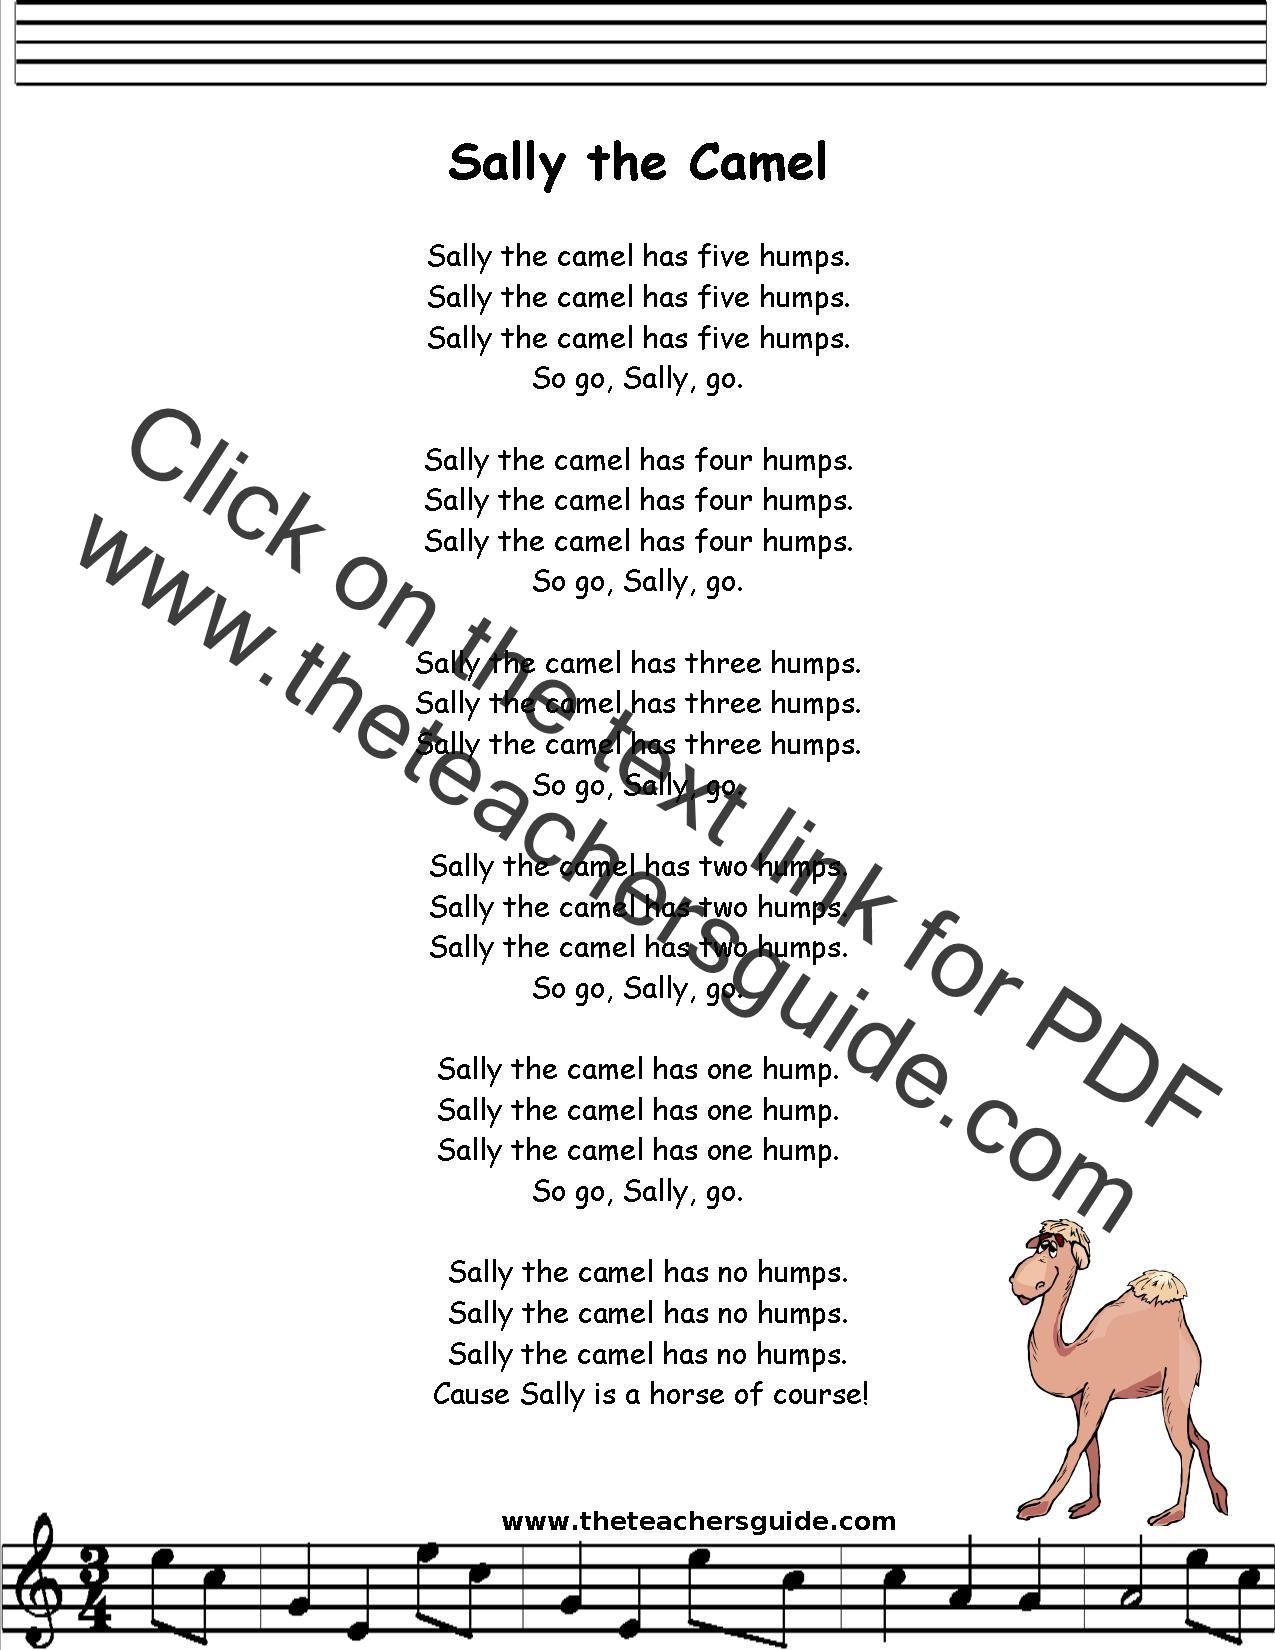 Sally The Camel Lyrics Printout Midi And Video